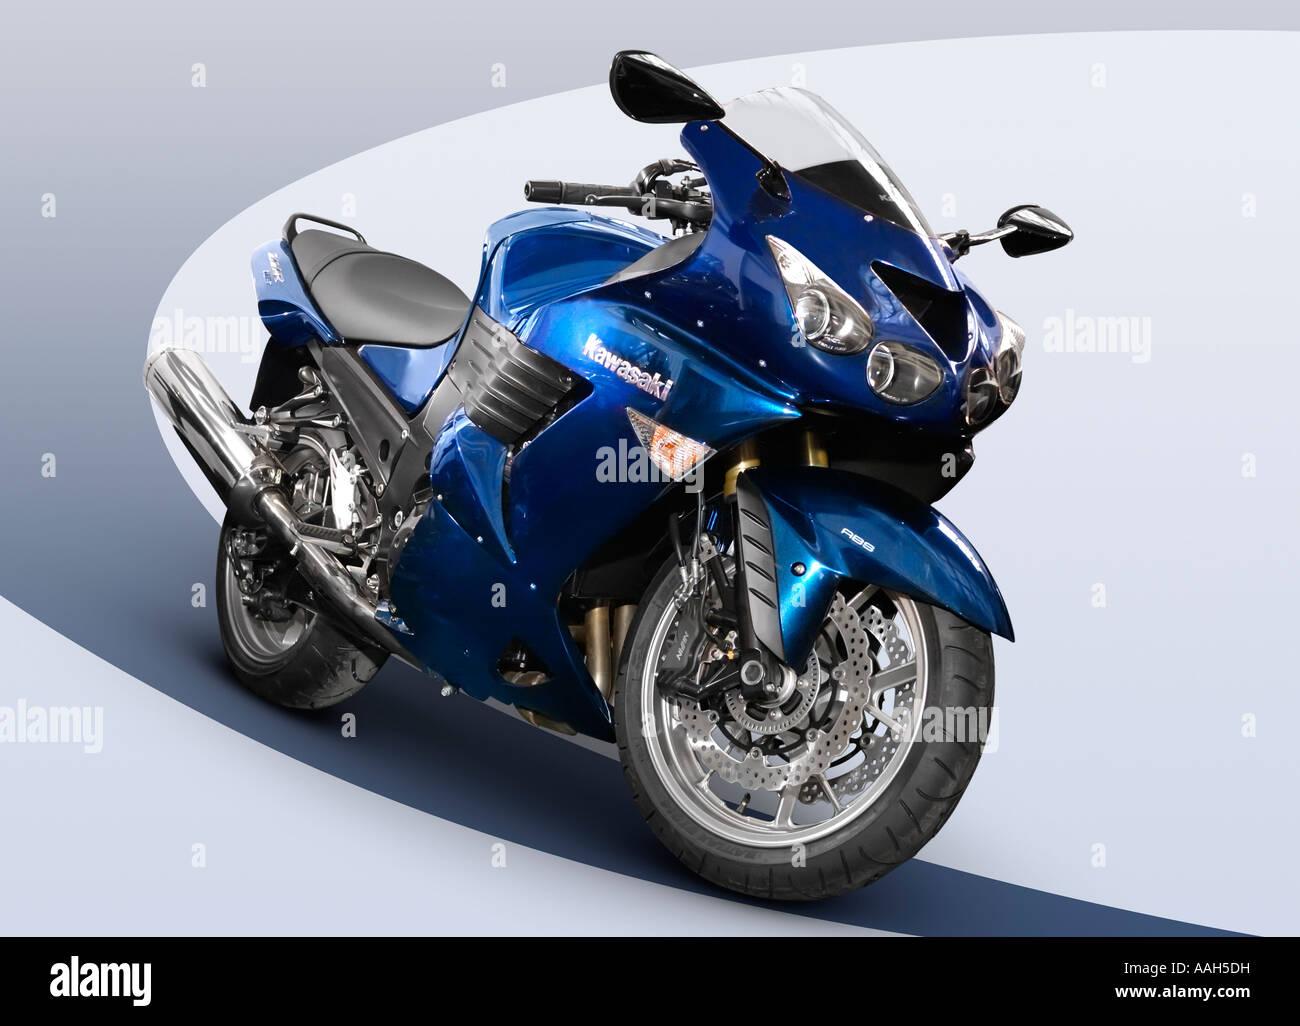 Kawasaki ZZR 1400 Motorrad Streetbike Fahrrad Isolierten Ausschnitt Stockbild